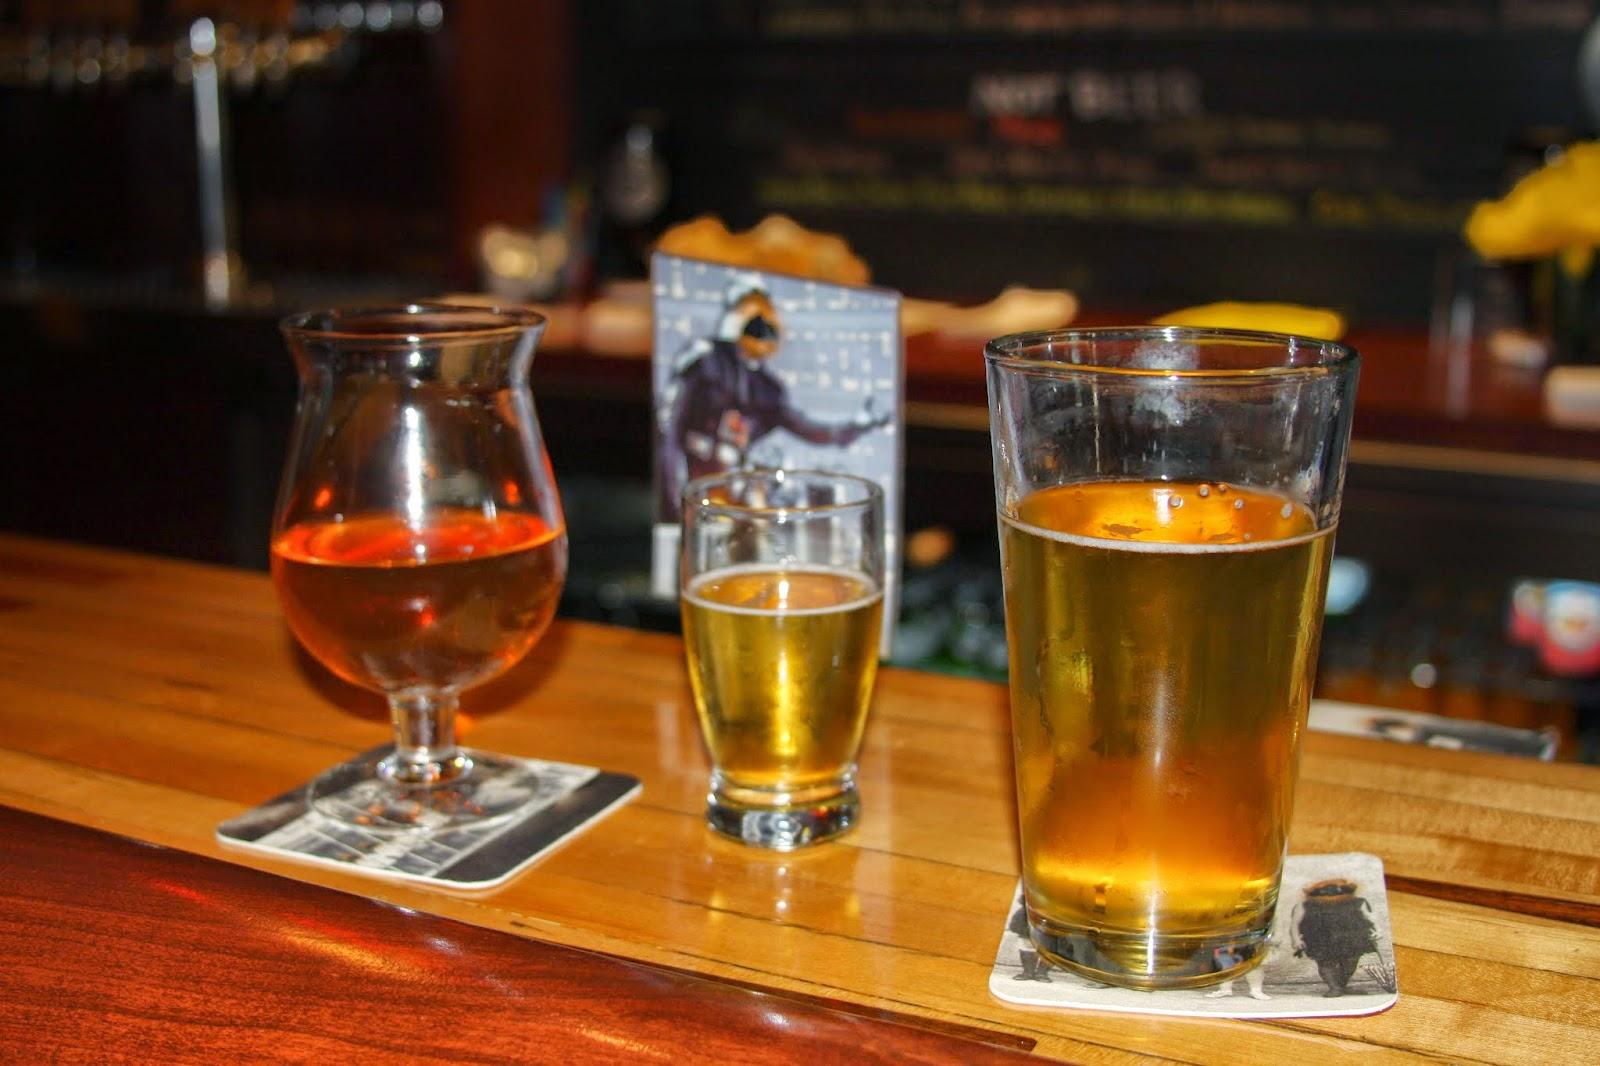 Frankfort Michigan, travel blog, blog, travel, adventure, brewery, storm cloud, micribeer